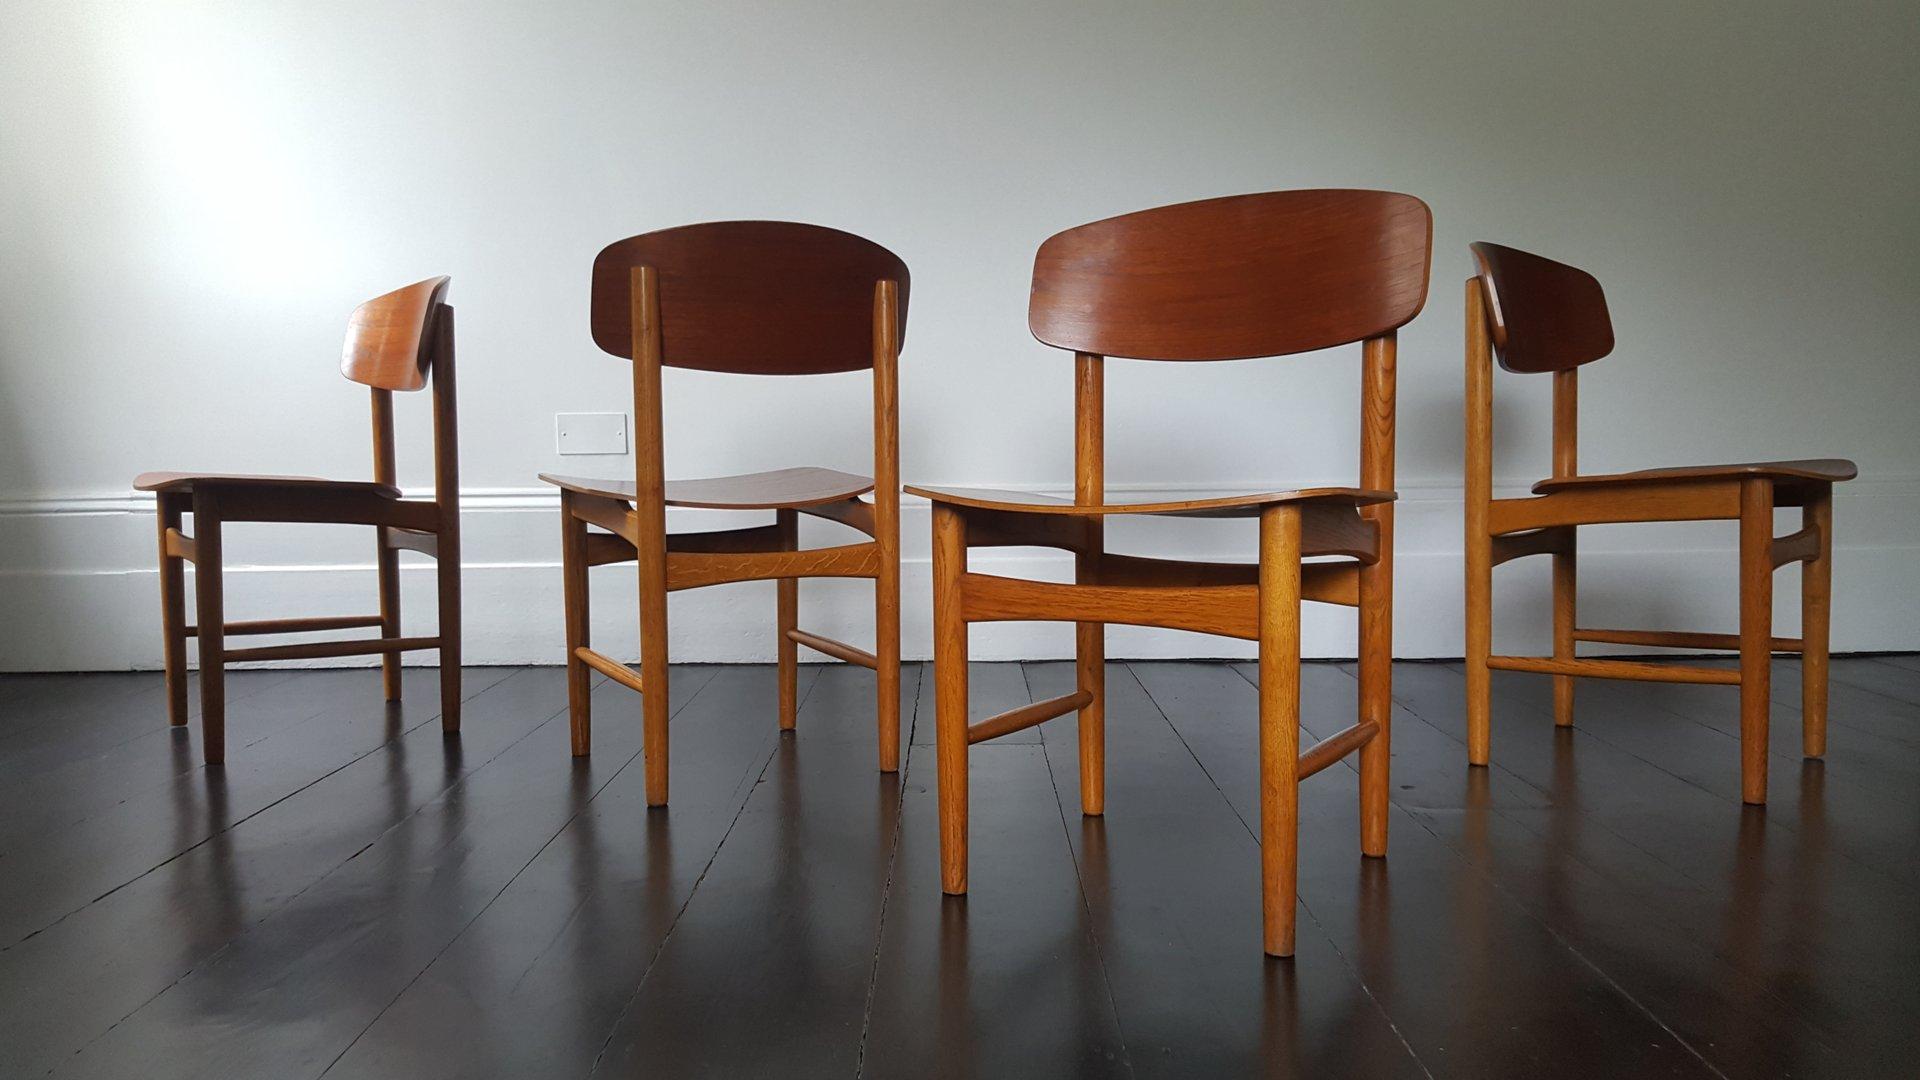 model 122 teak oak dining chairs by bà rge mogensen for sà borg